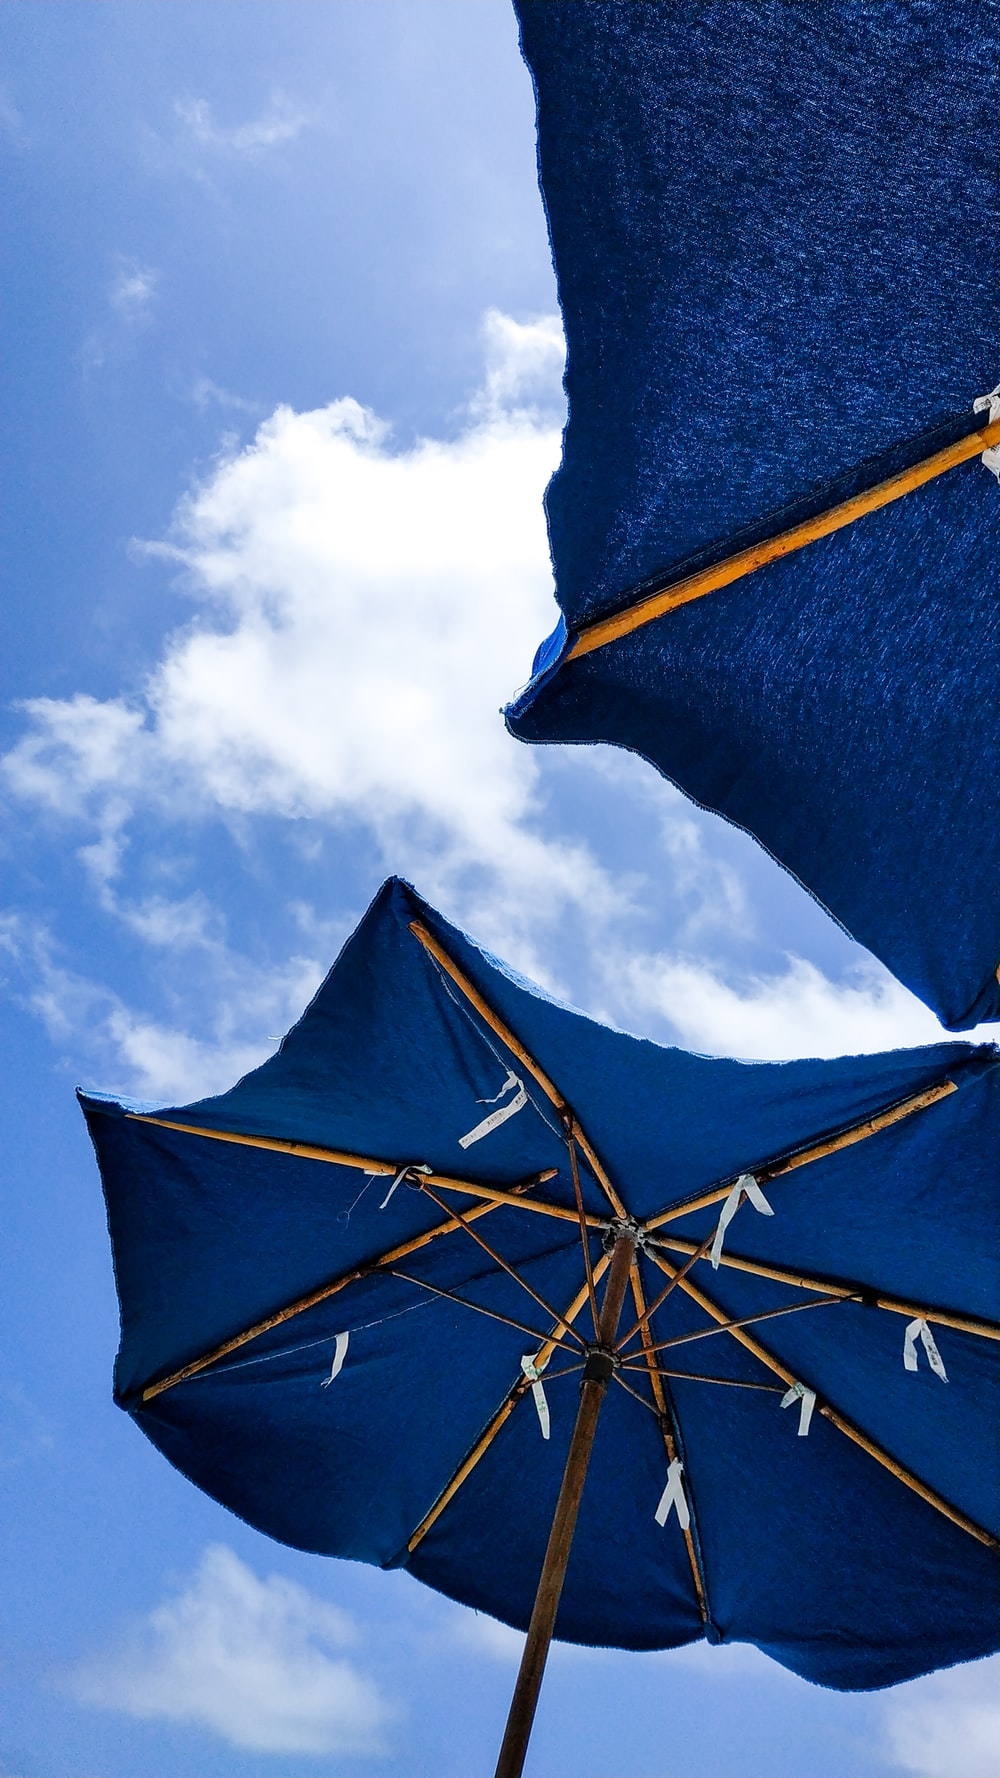 two blue umbrellas